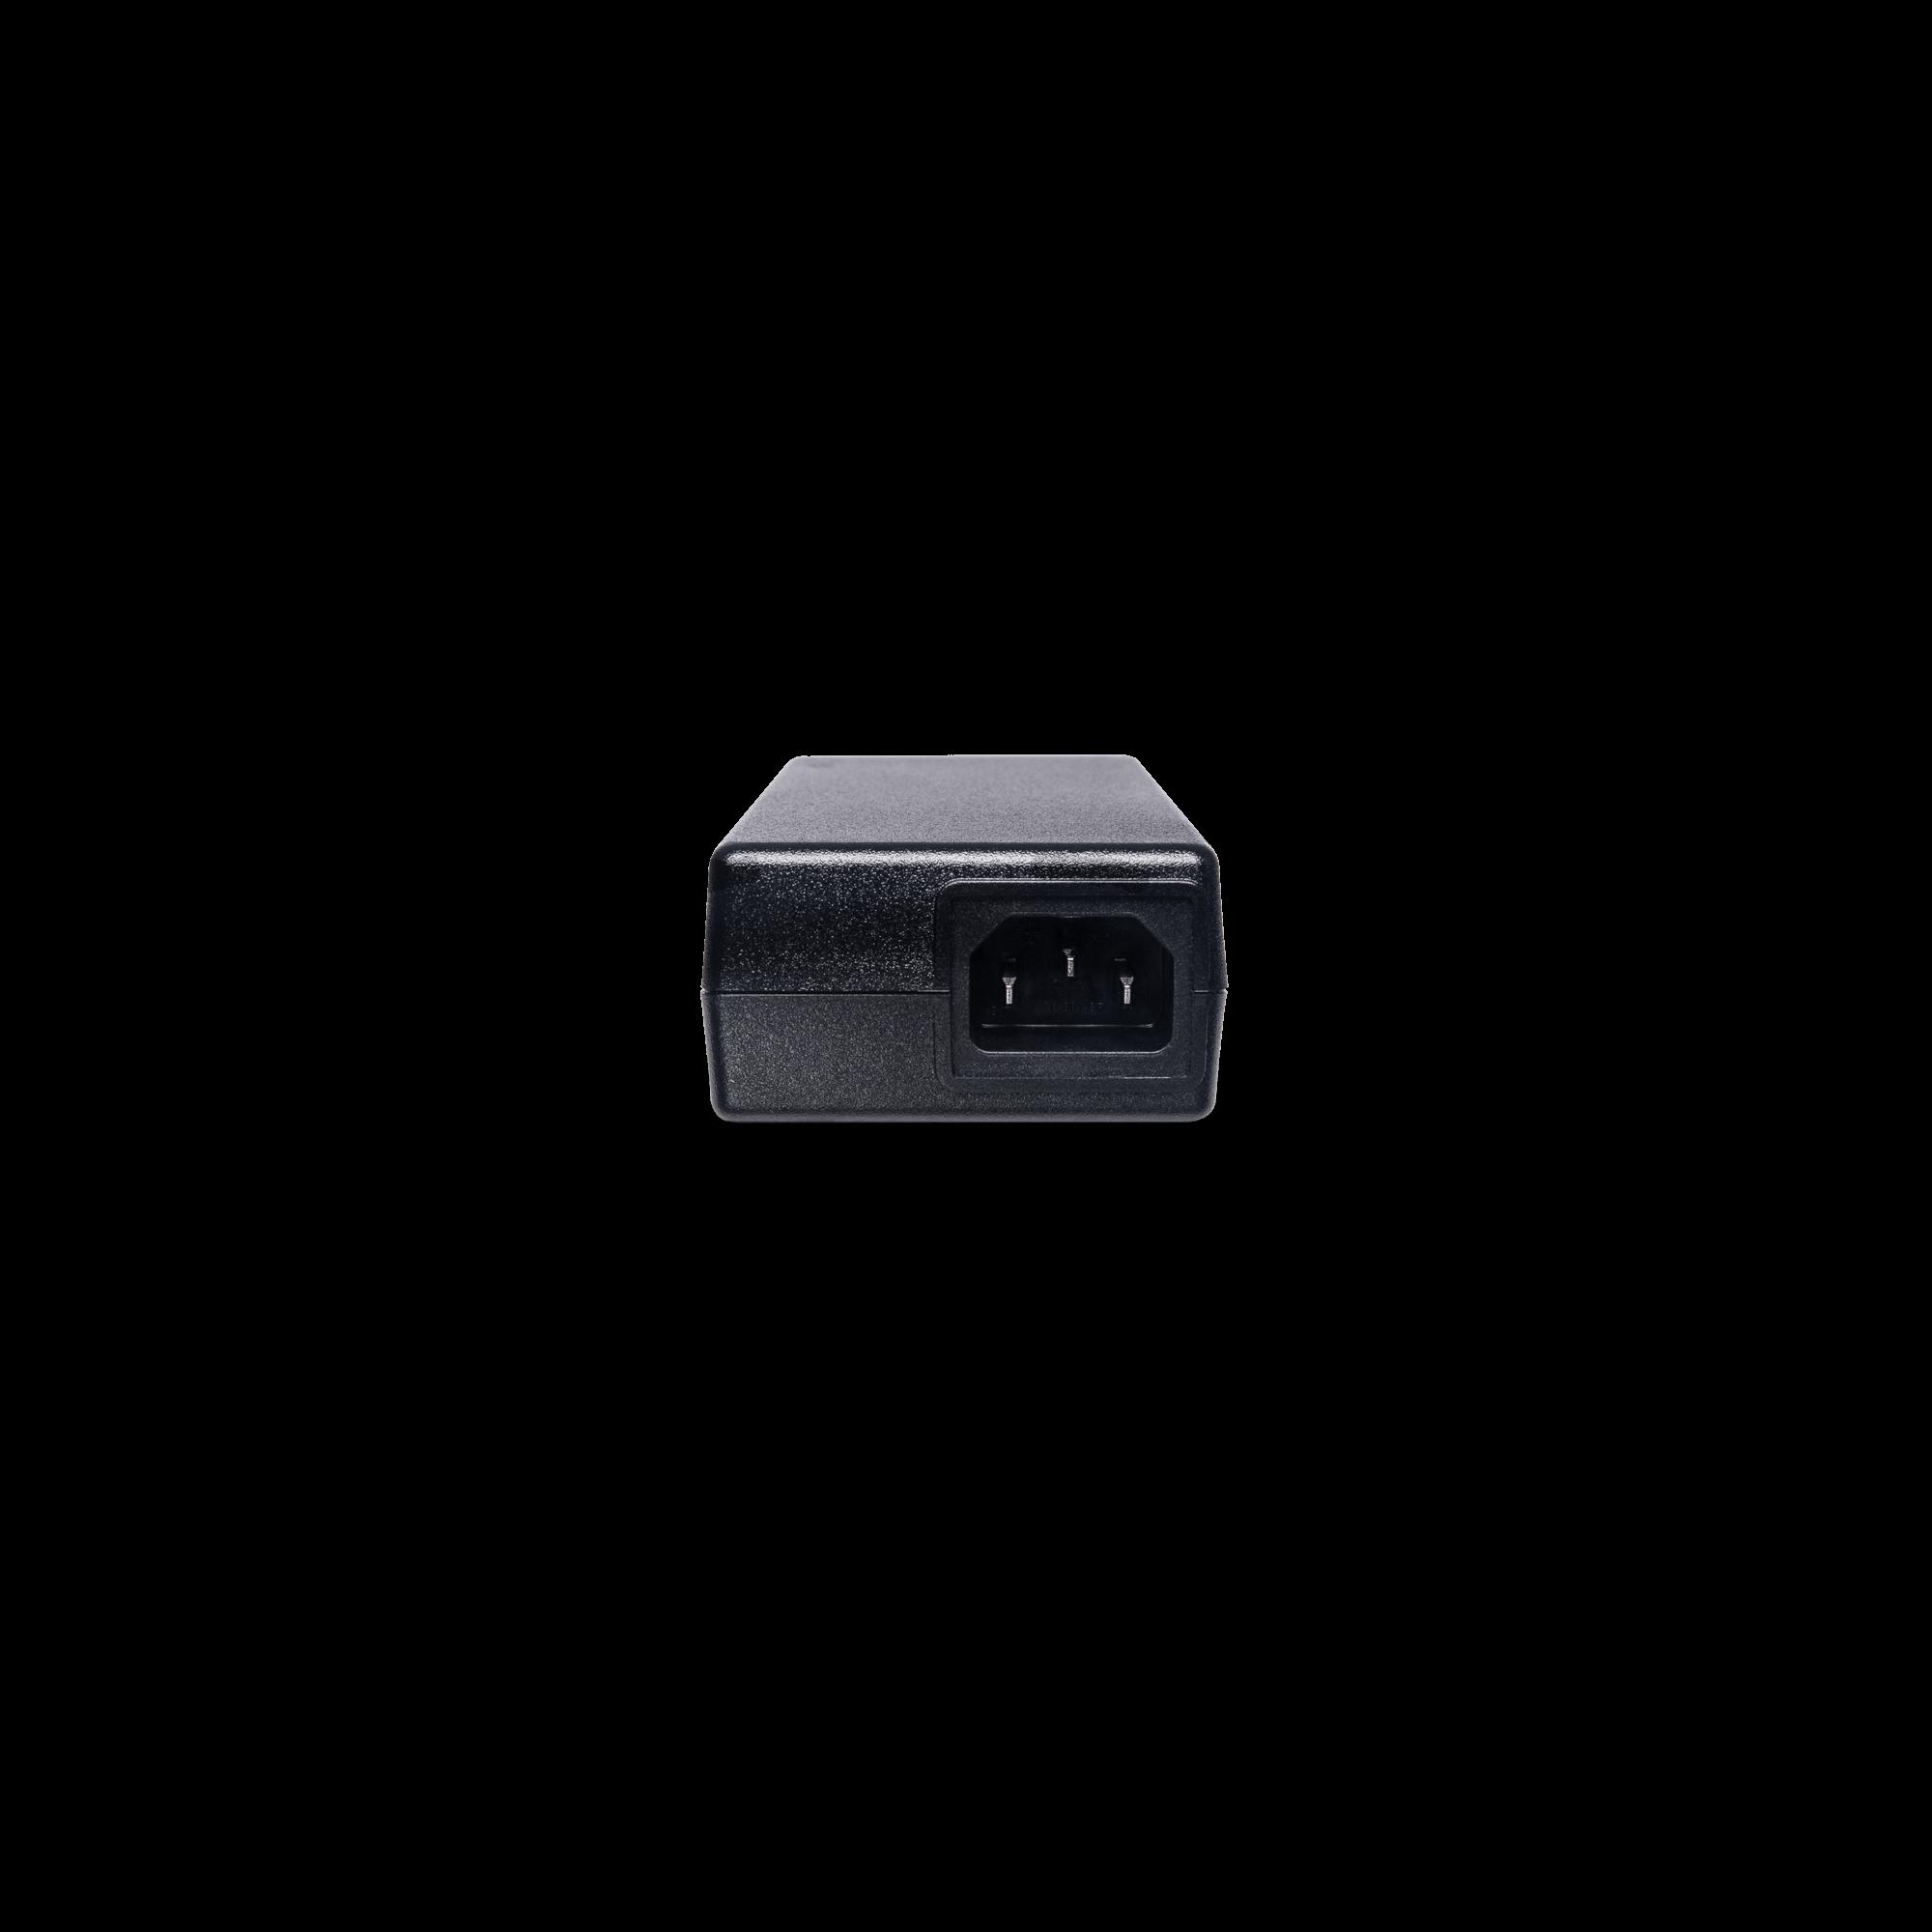 DC56V 90W power adapter